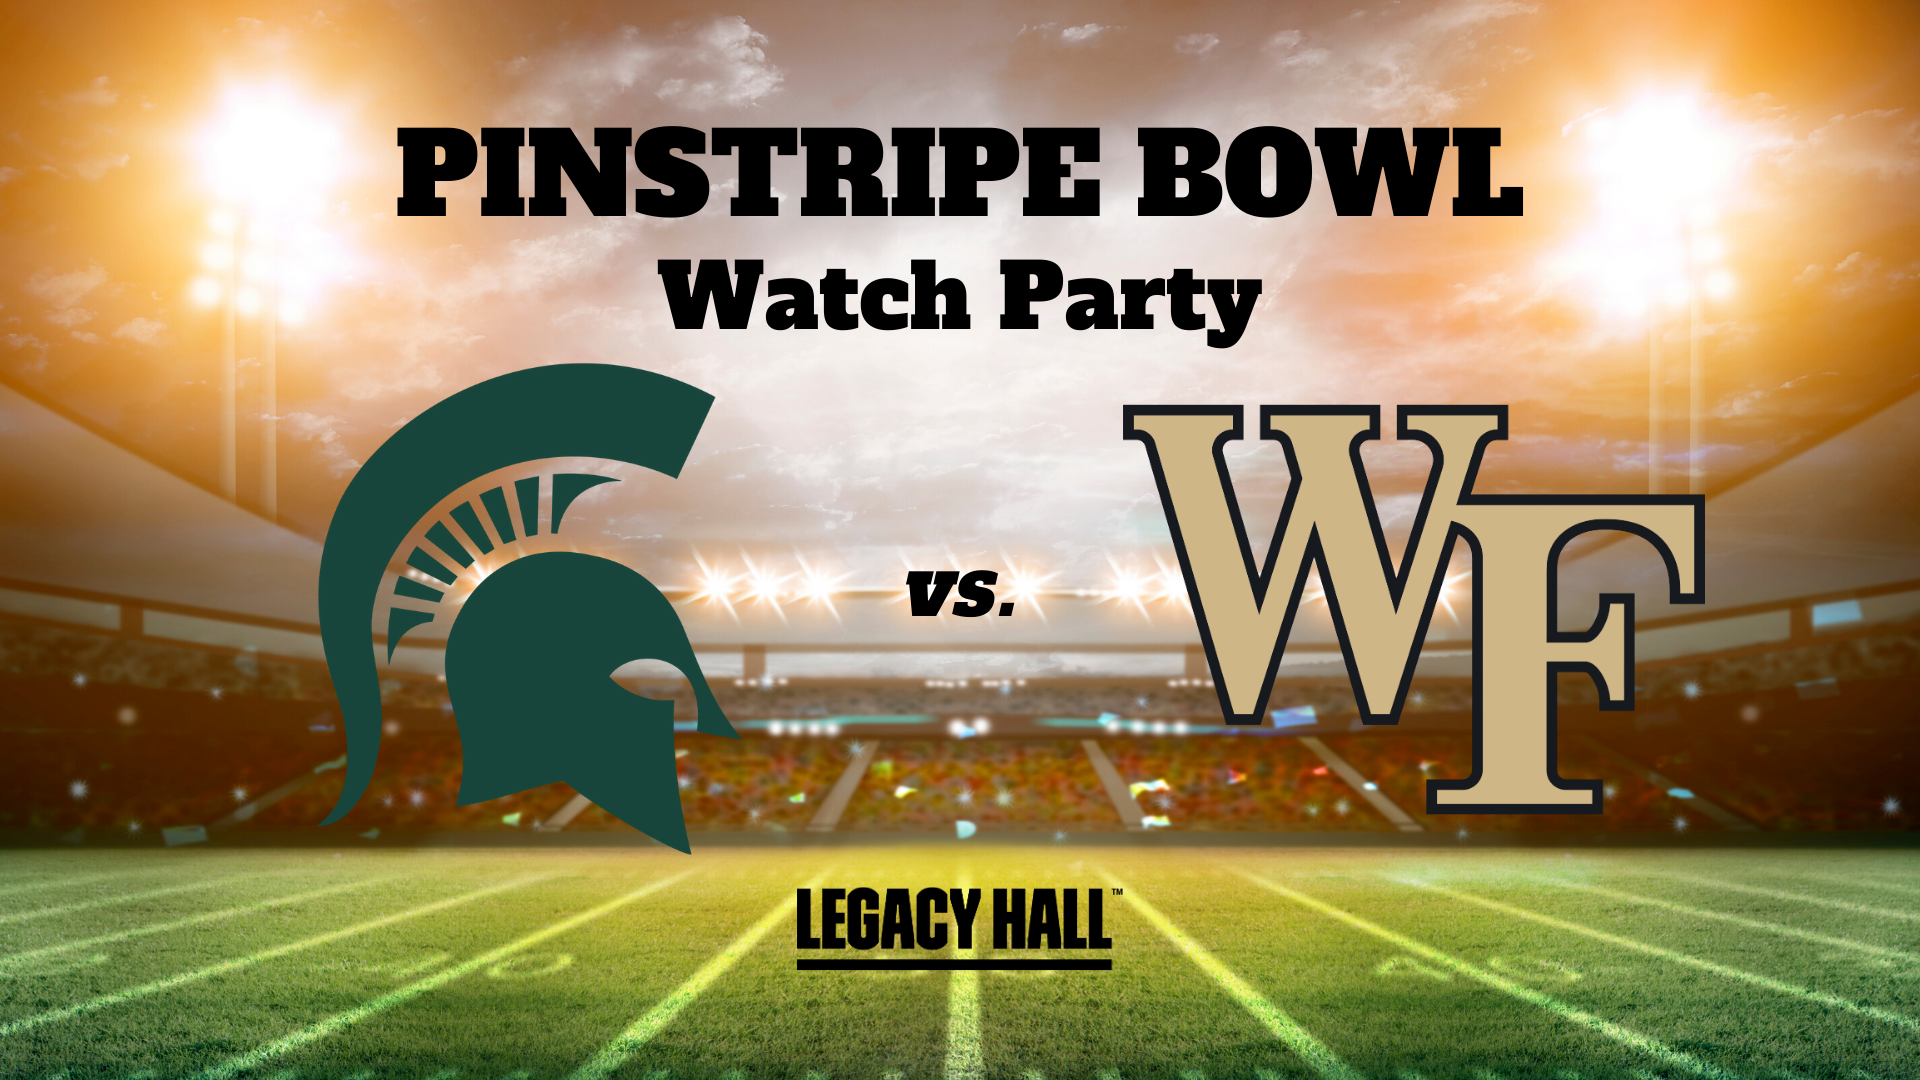 Pinstripe Bowl Watch Party - hero